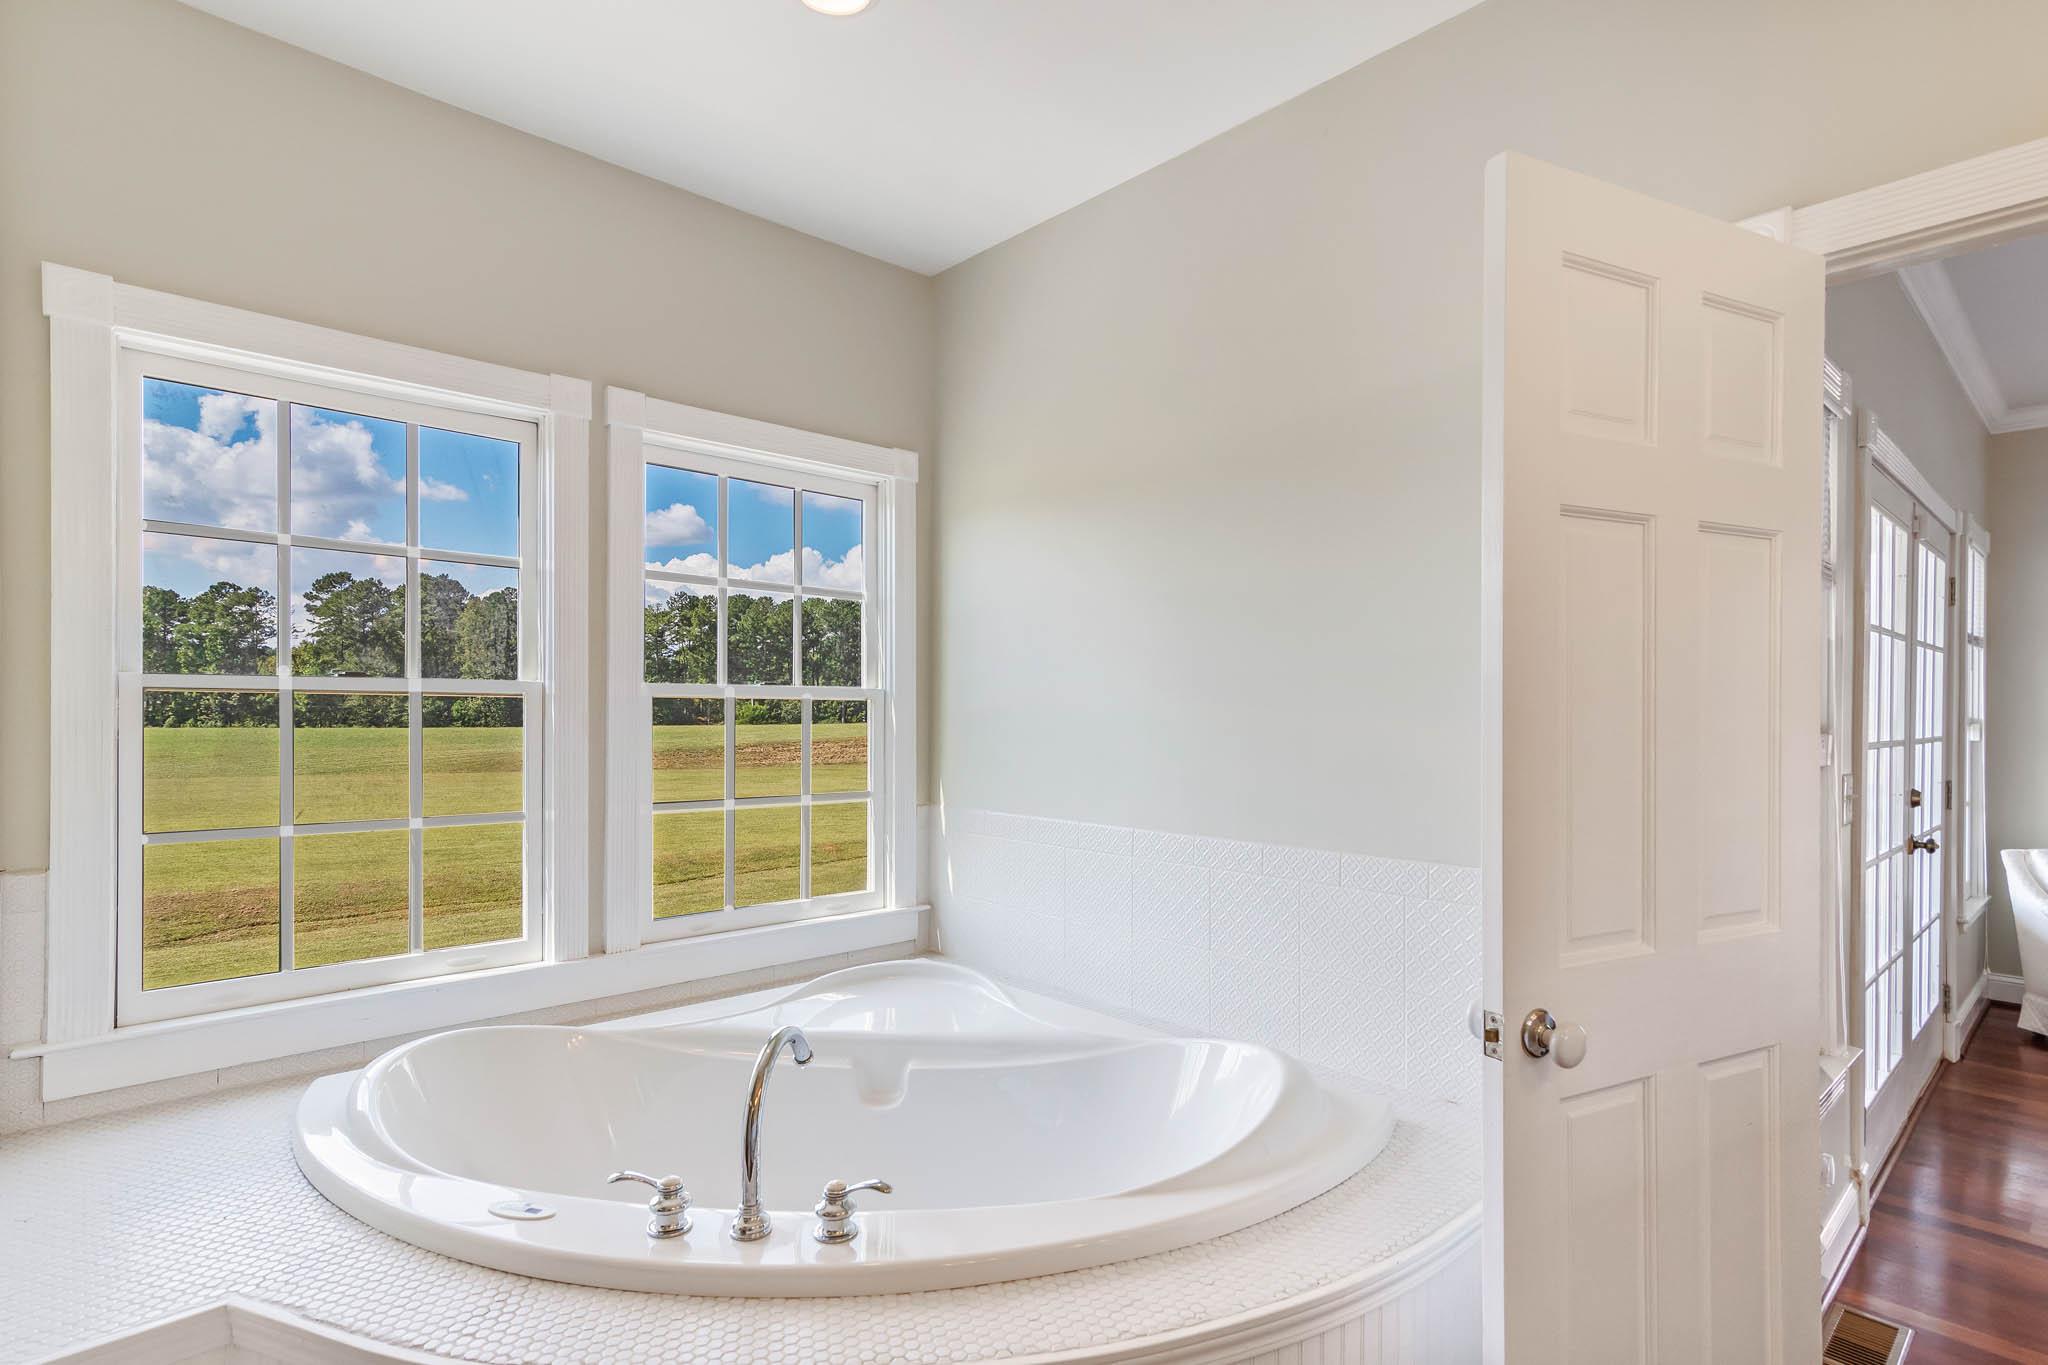 real_estate_photographer_bathroom_photography-7.jpg